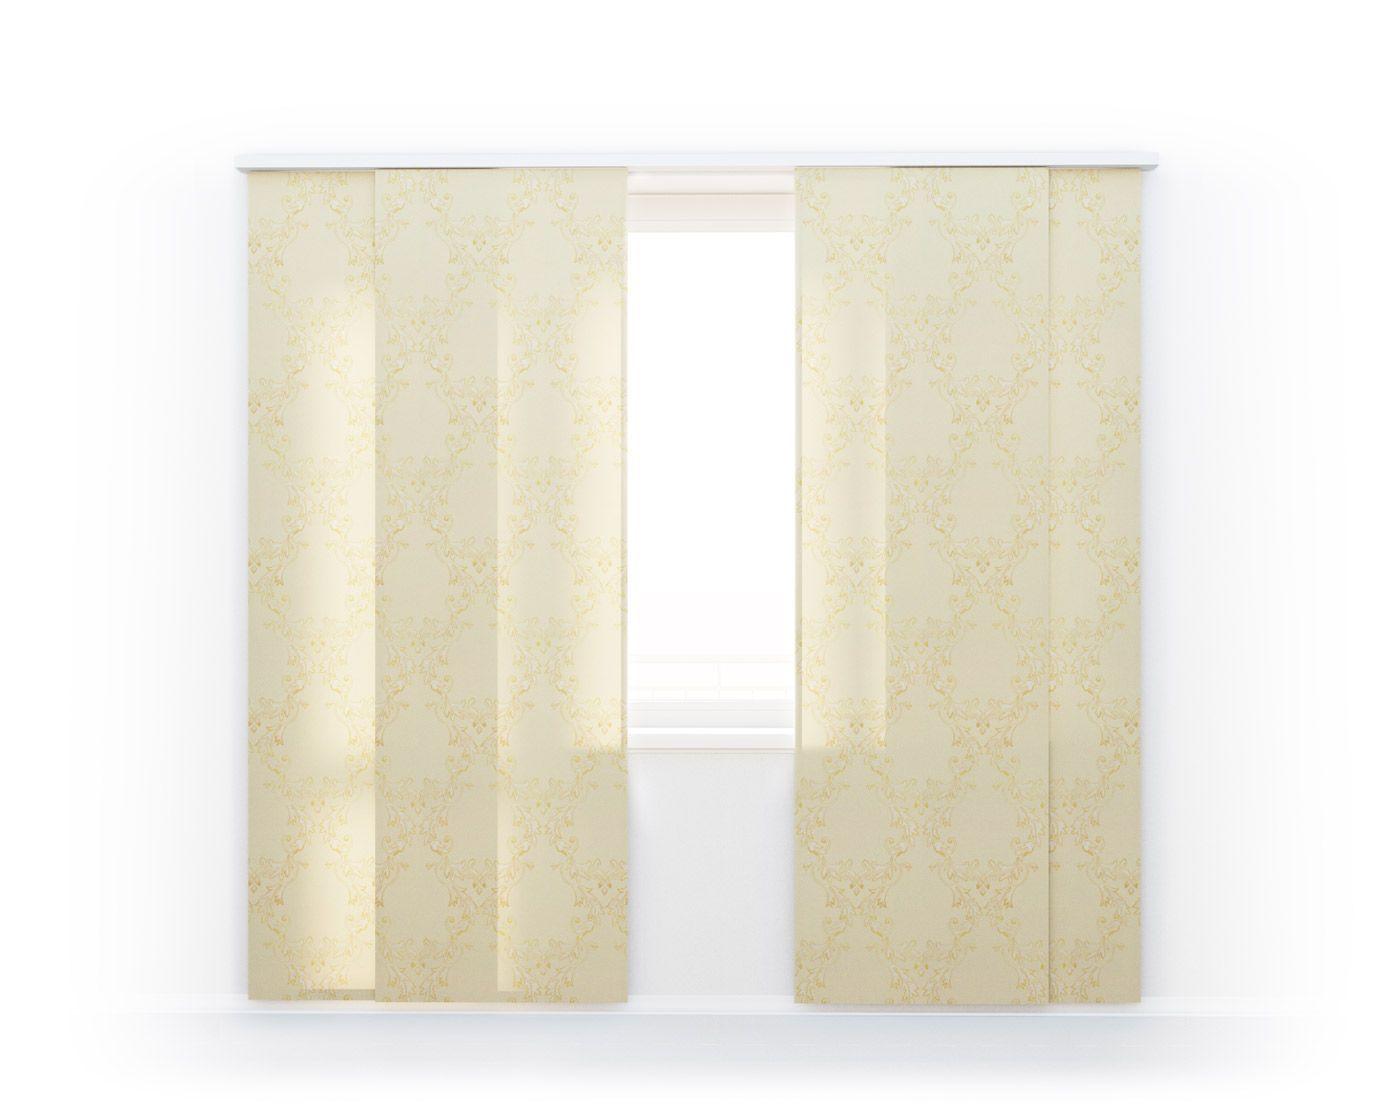 Японские шторы Louis D'or, 2375/24